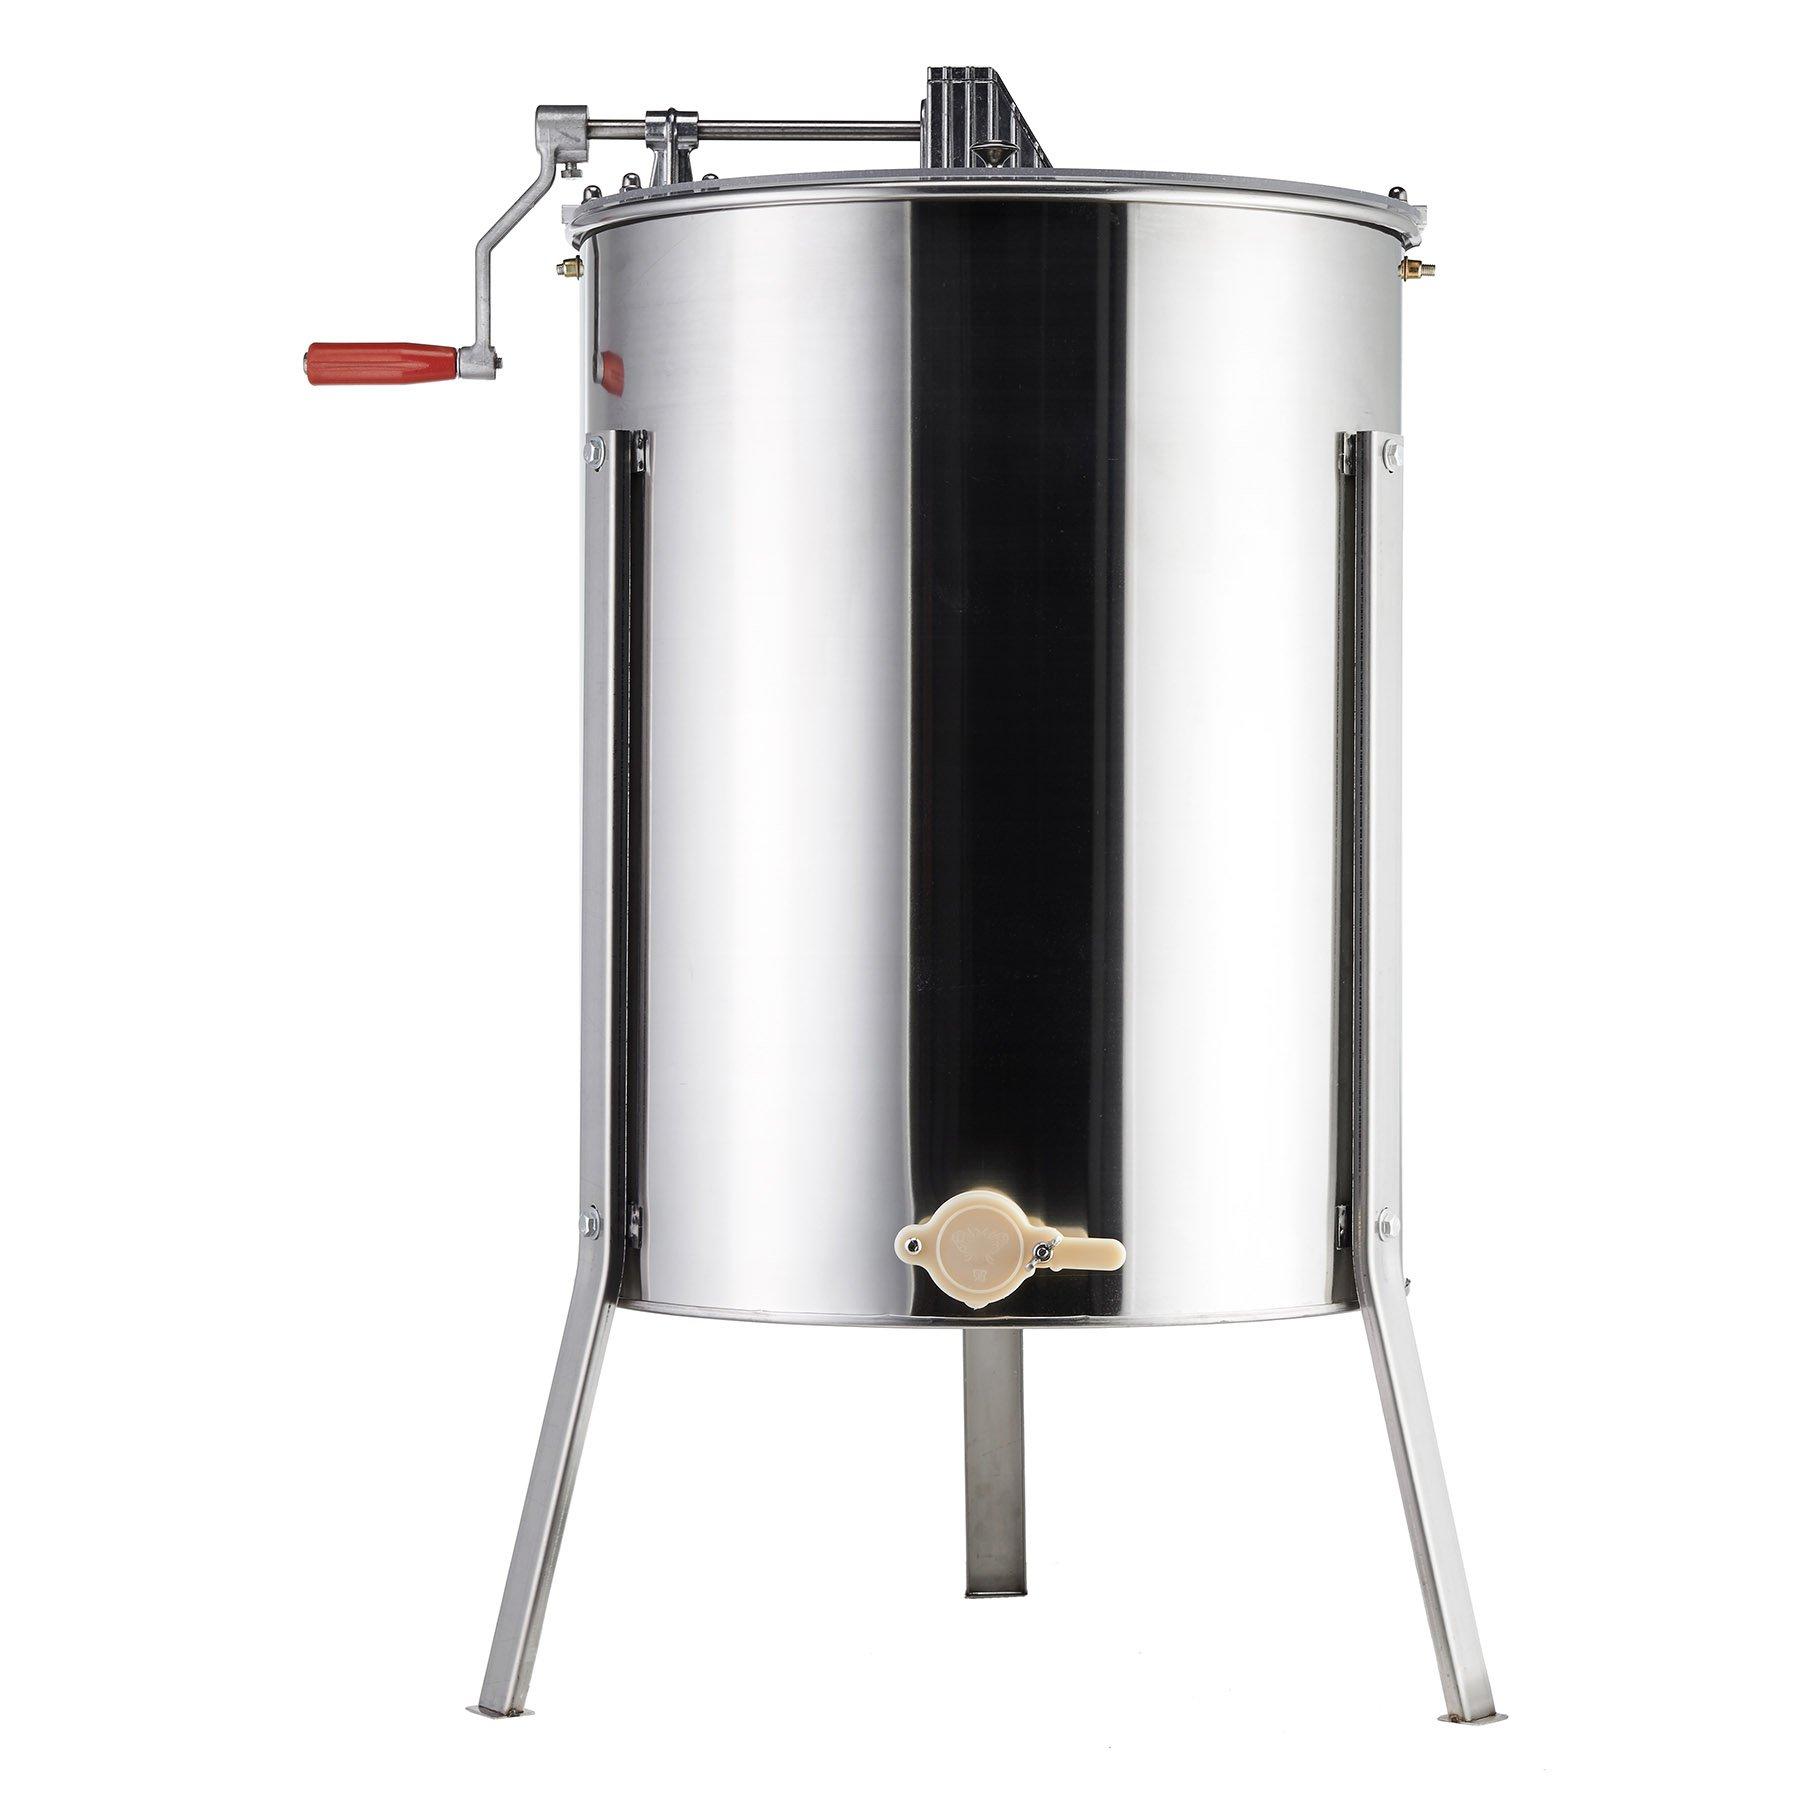 Tek Motion 4-Frame Large Stainless Steel Honey Extractor SS Beekeeping Equipment